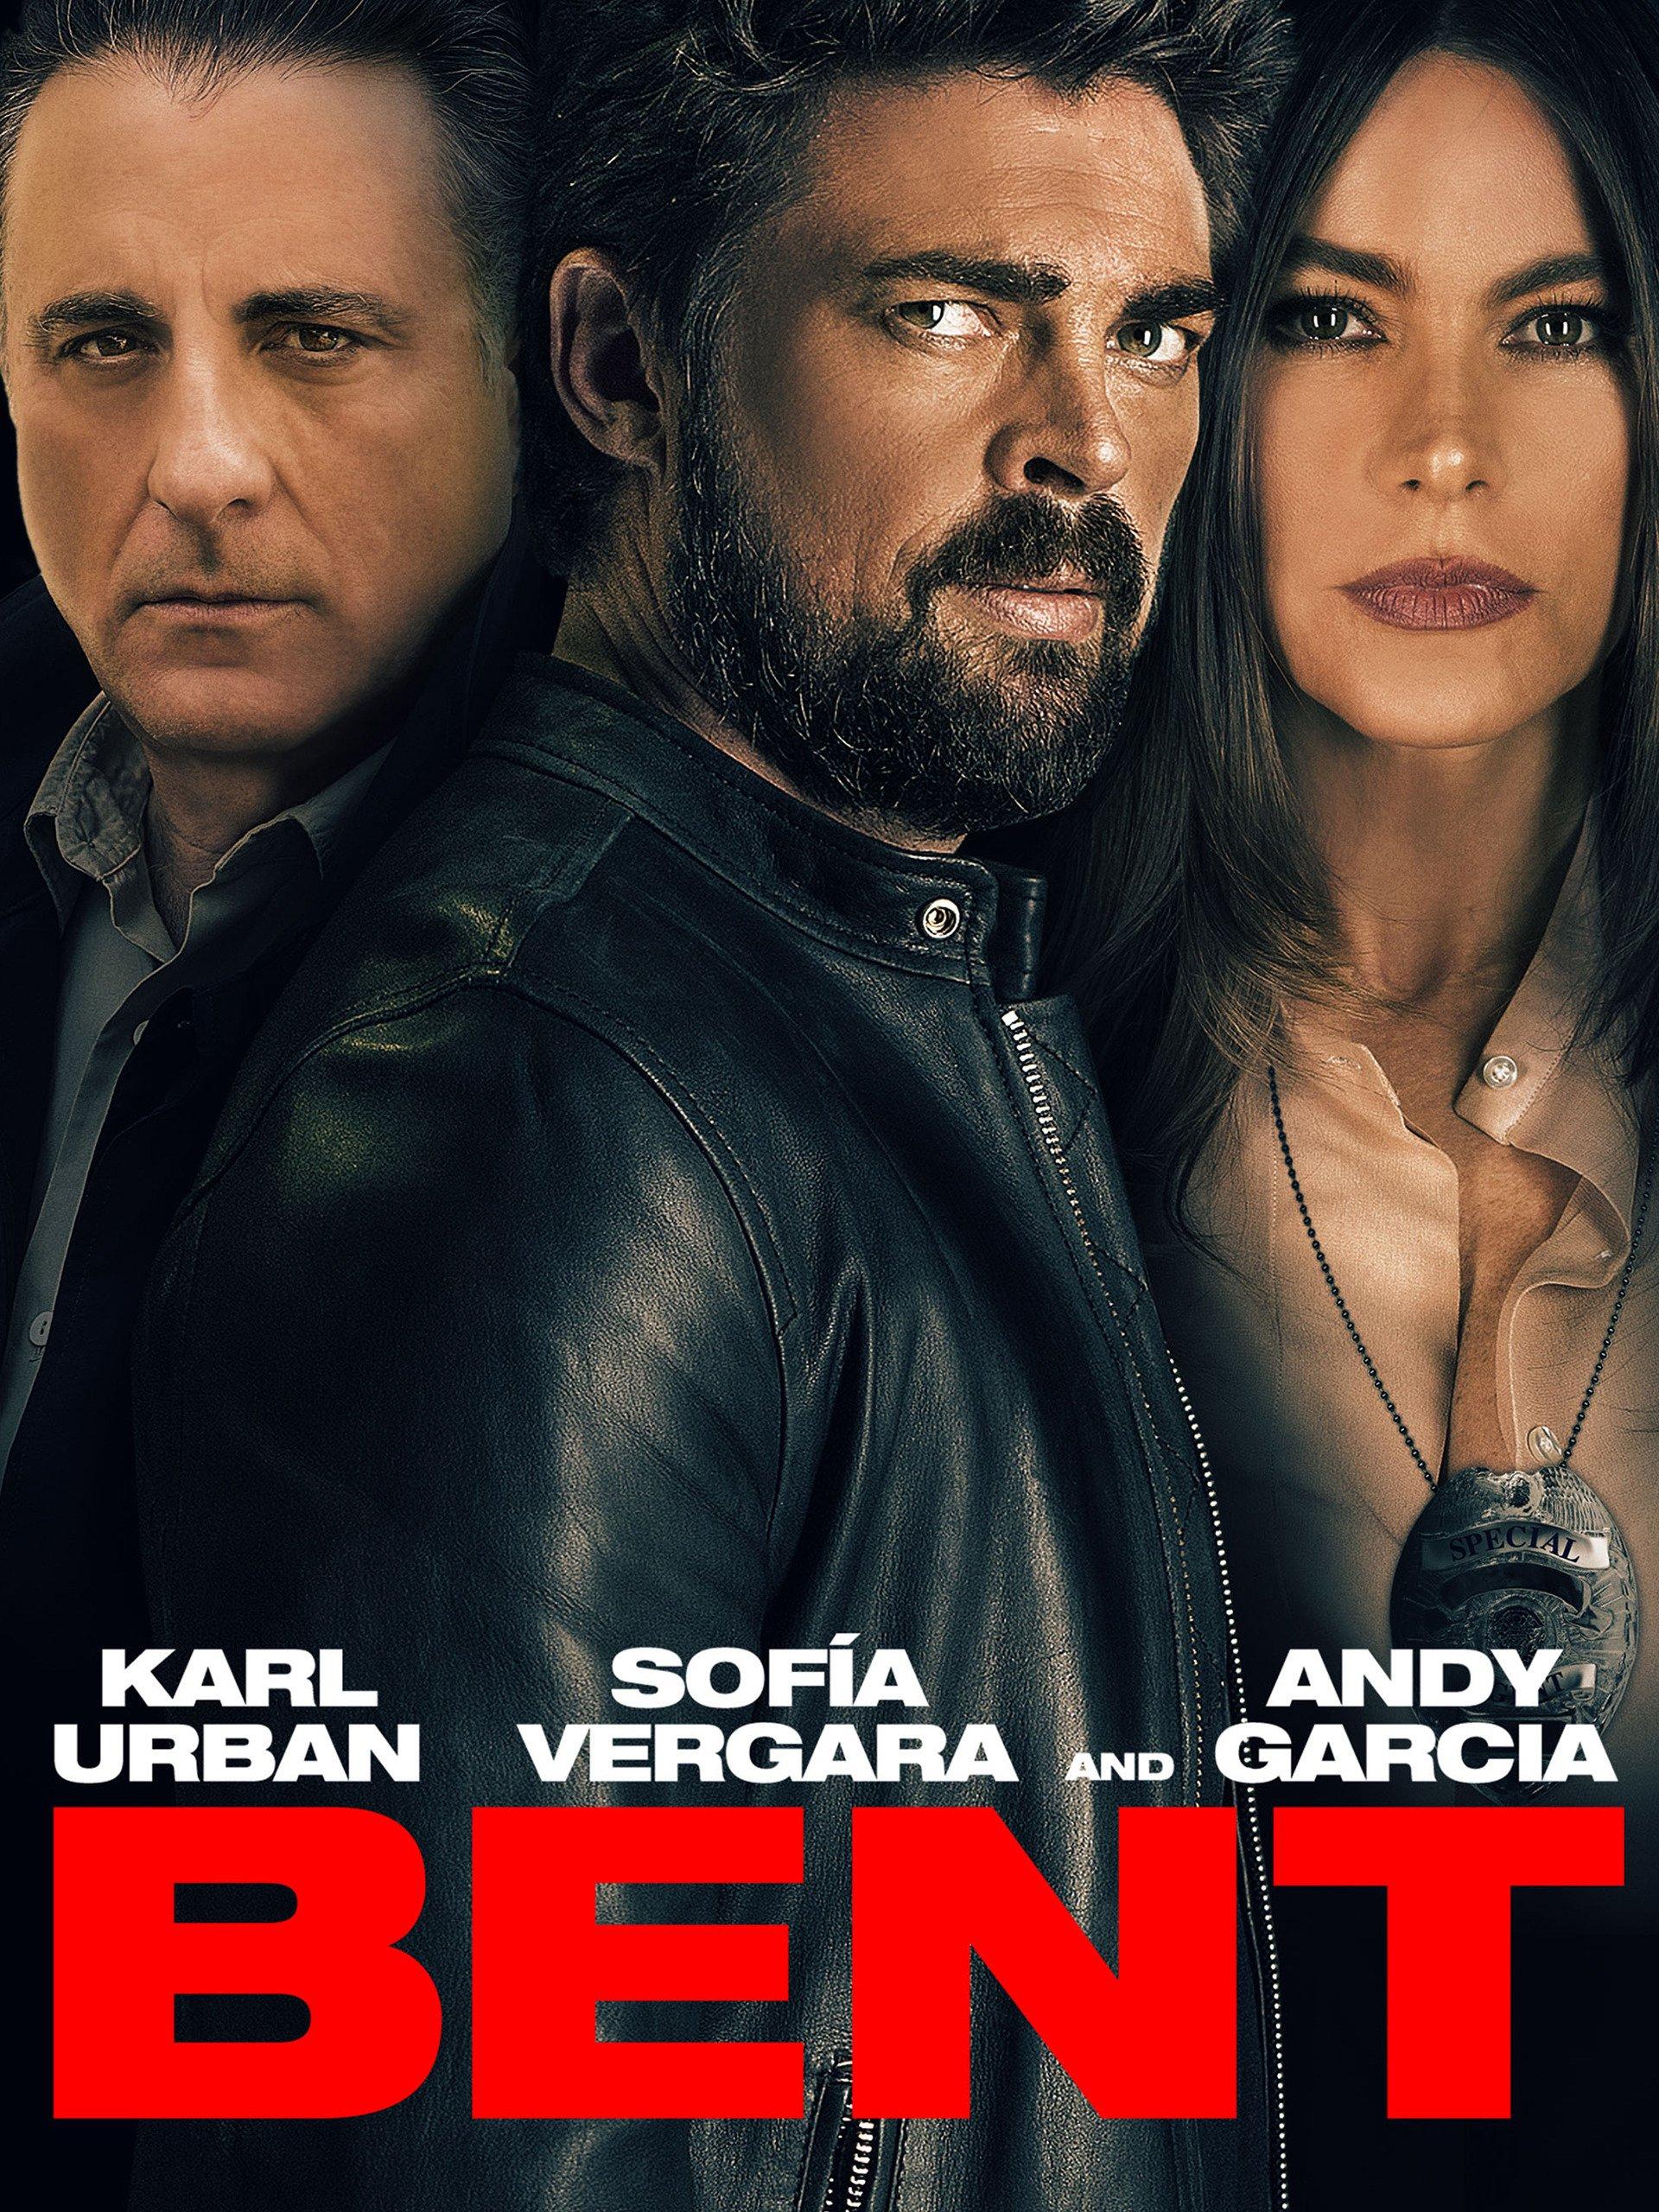 Amazon.com: Bent: Karl Urban, Sofia Vergara, Andy Garcia, Grace Byers